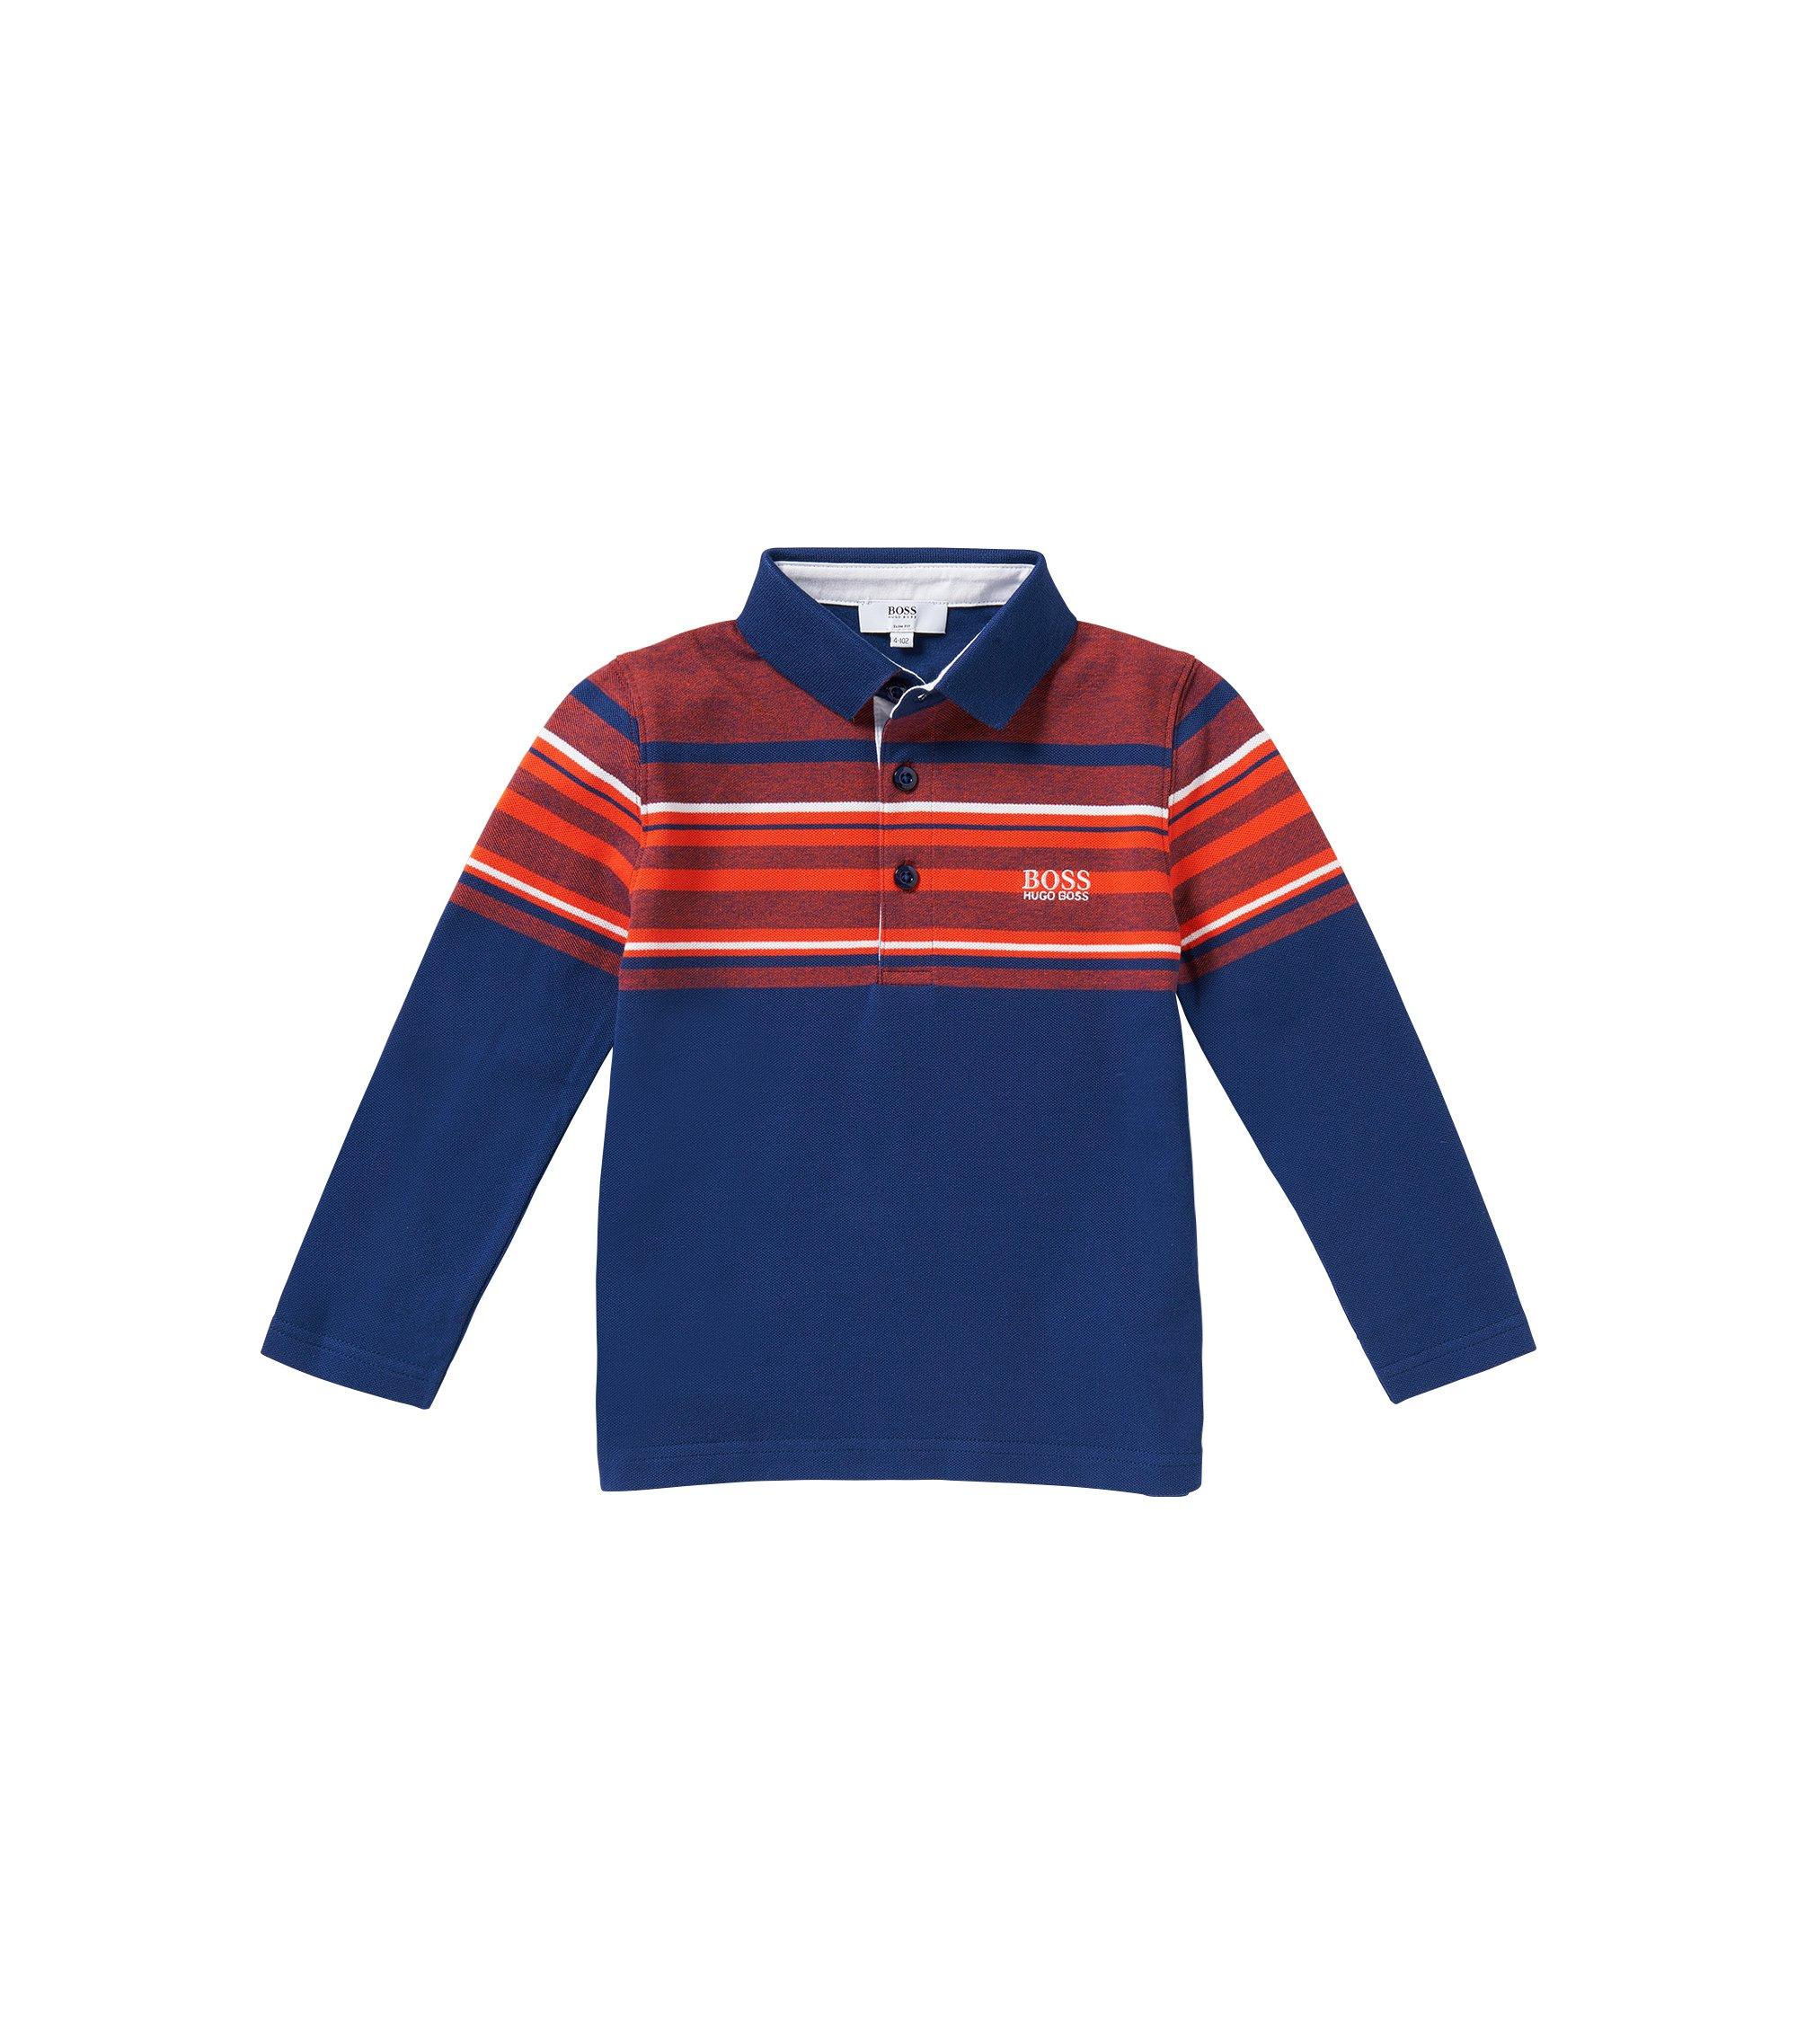 Kids-Polo aus Baumwolle: 'J25857', Dunkelblau